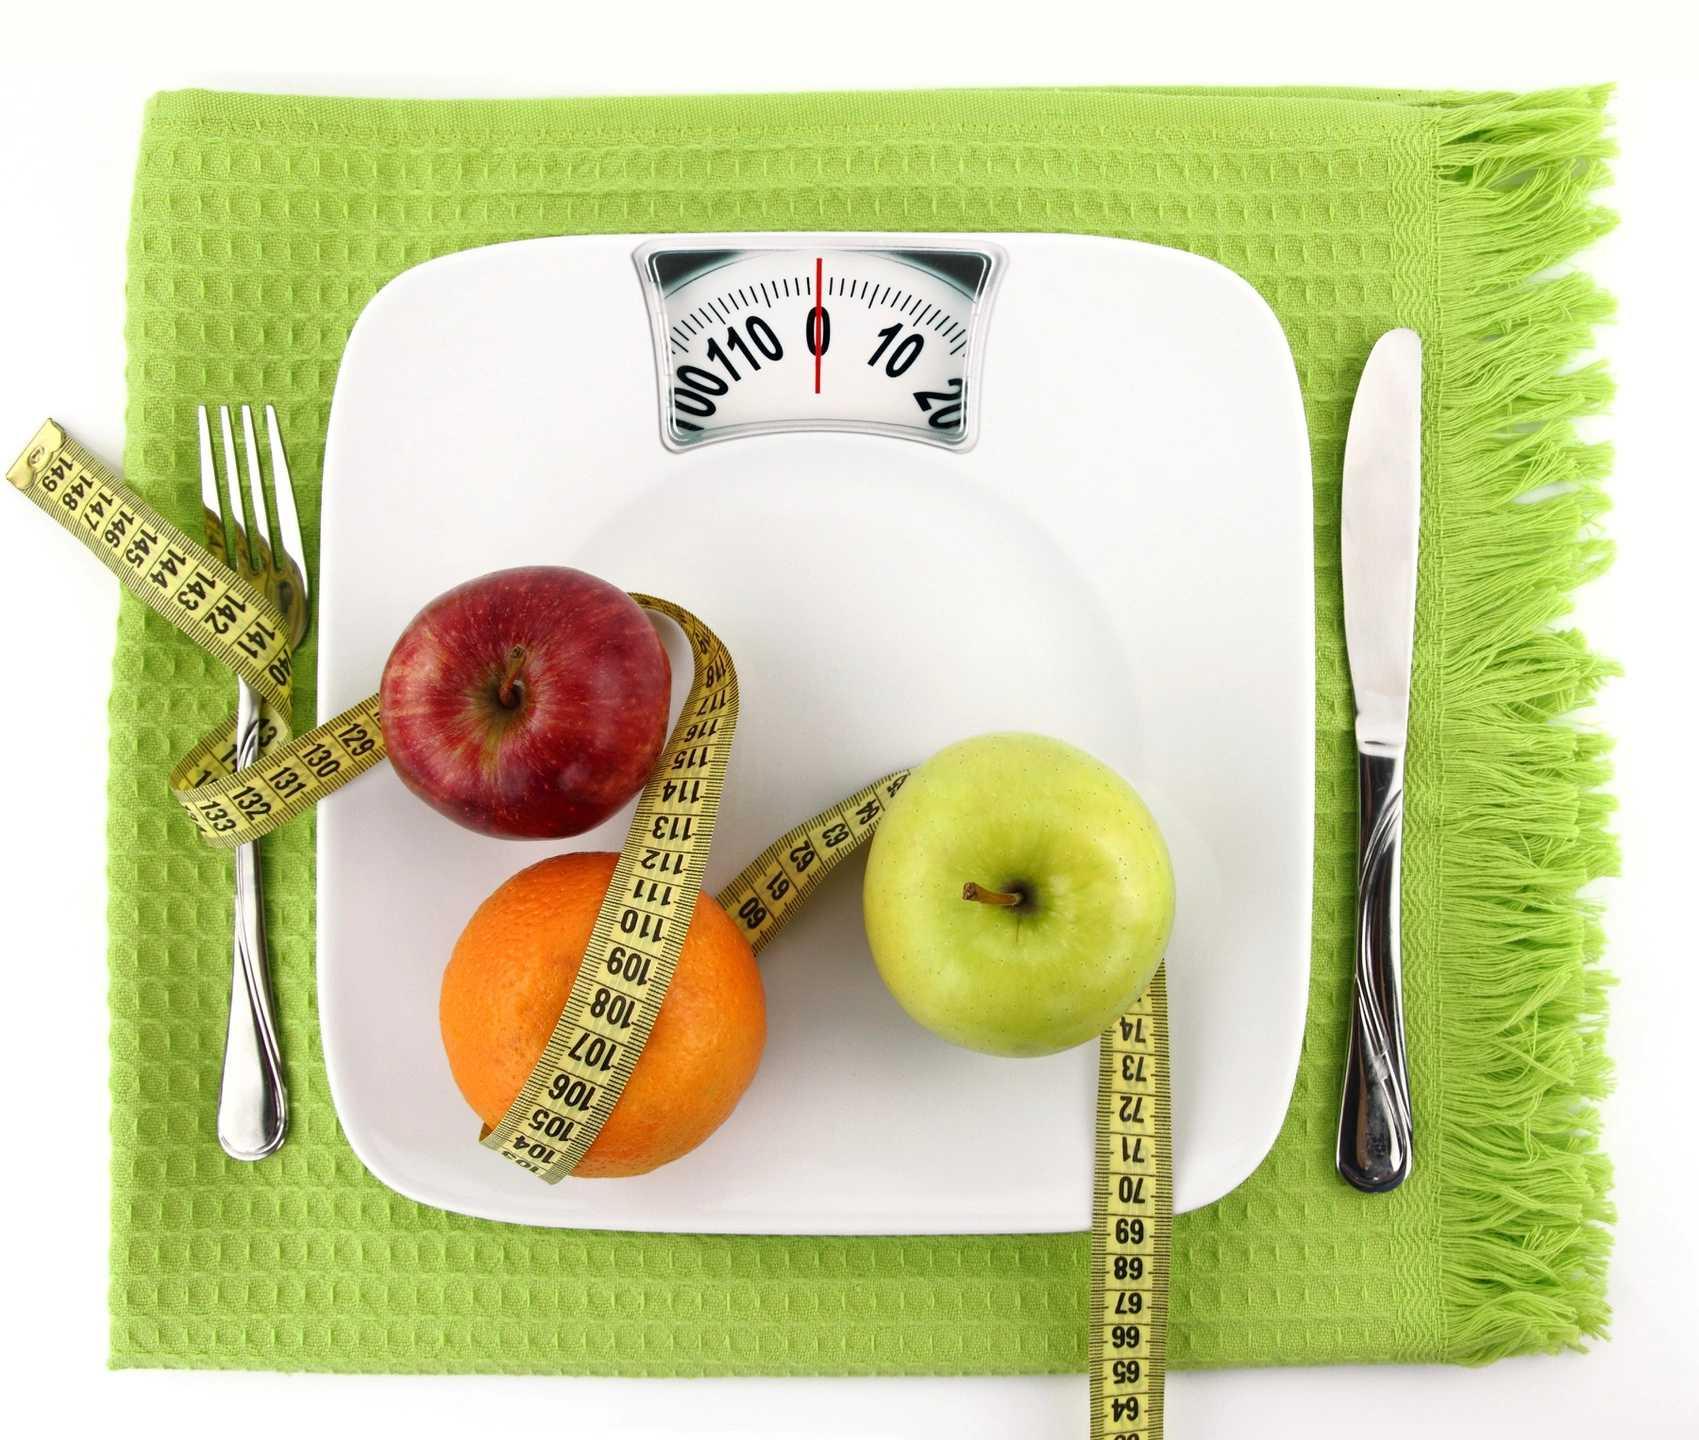 Weight Loss Fairfax Va 703 844 0184 Metabolic Measurements